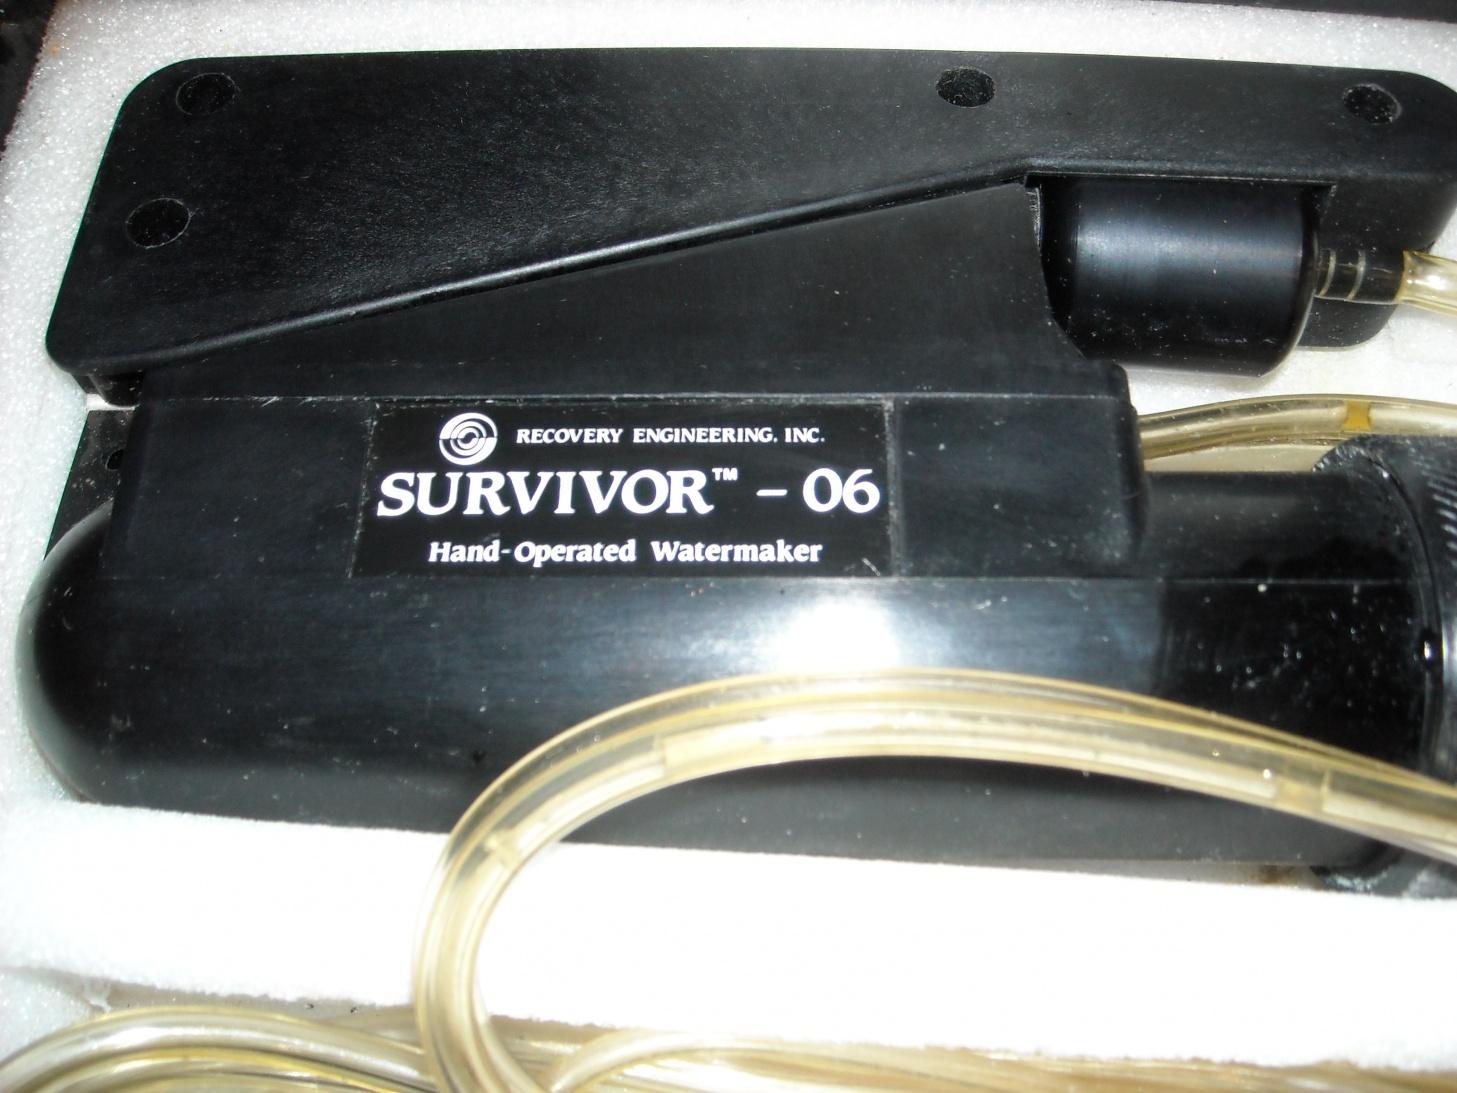 Click image for larger version  Name:Watermaker Survivor 06 004.jpg Views:75 Size:409.6 KB ID:48112